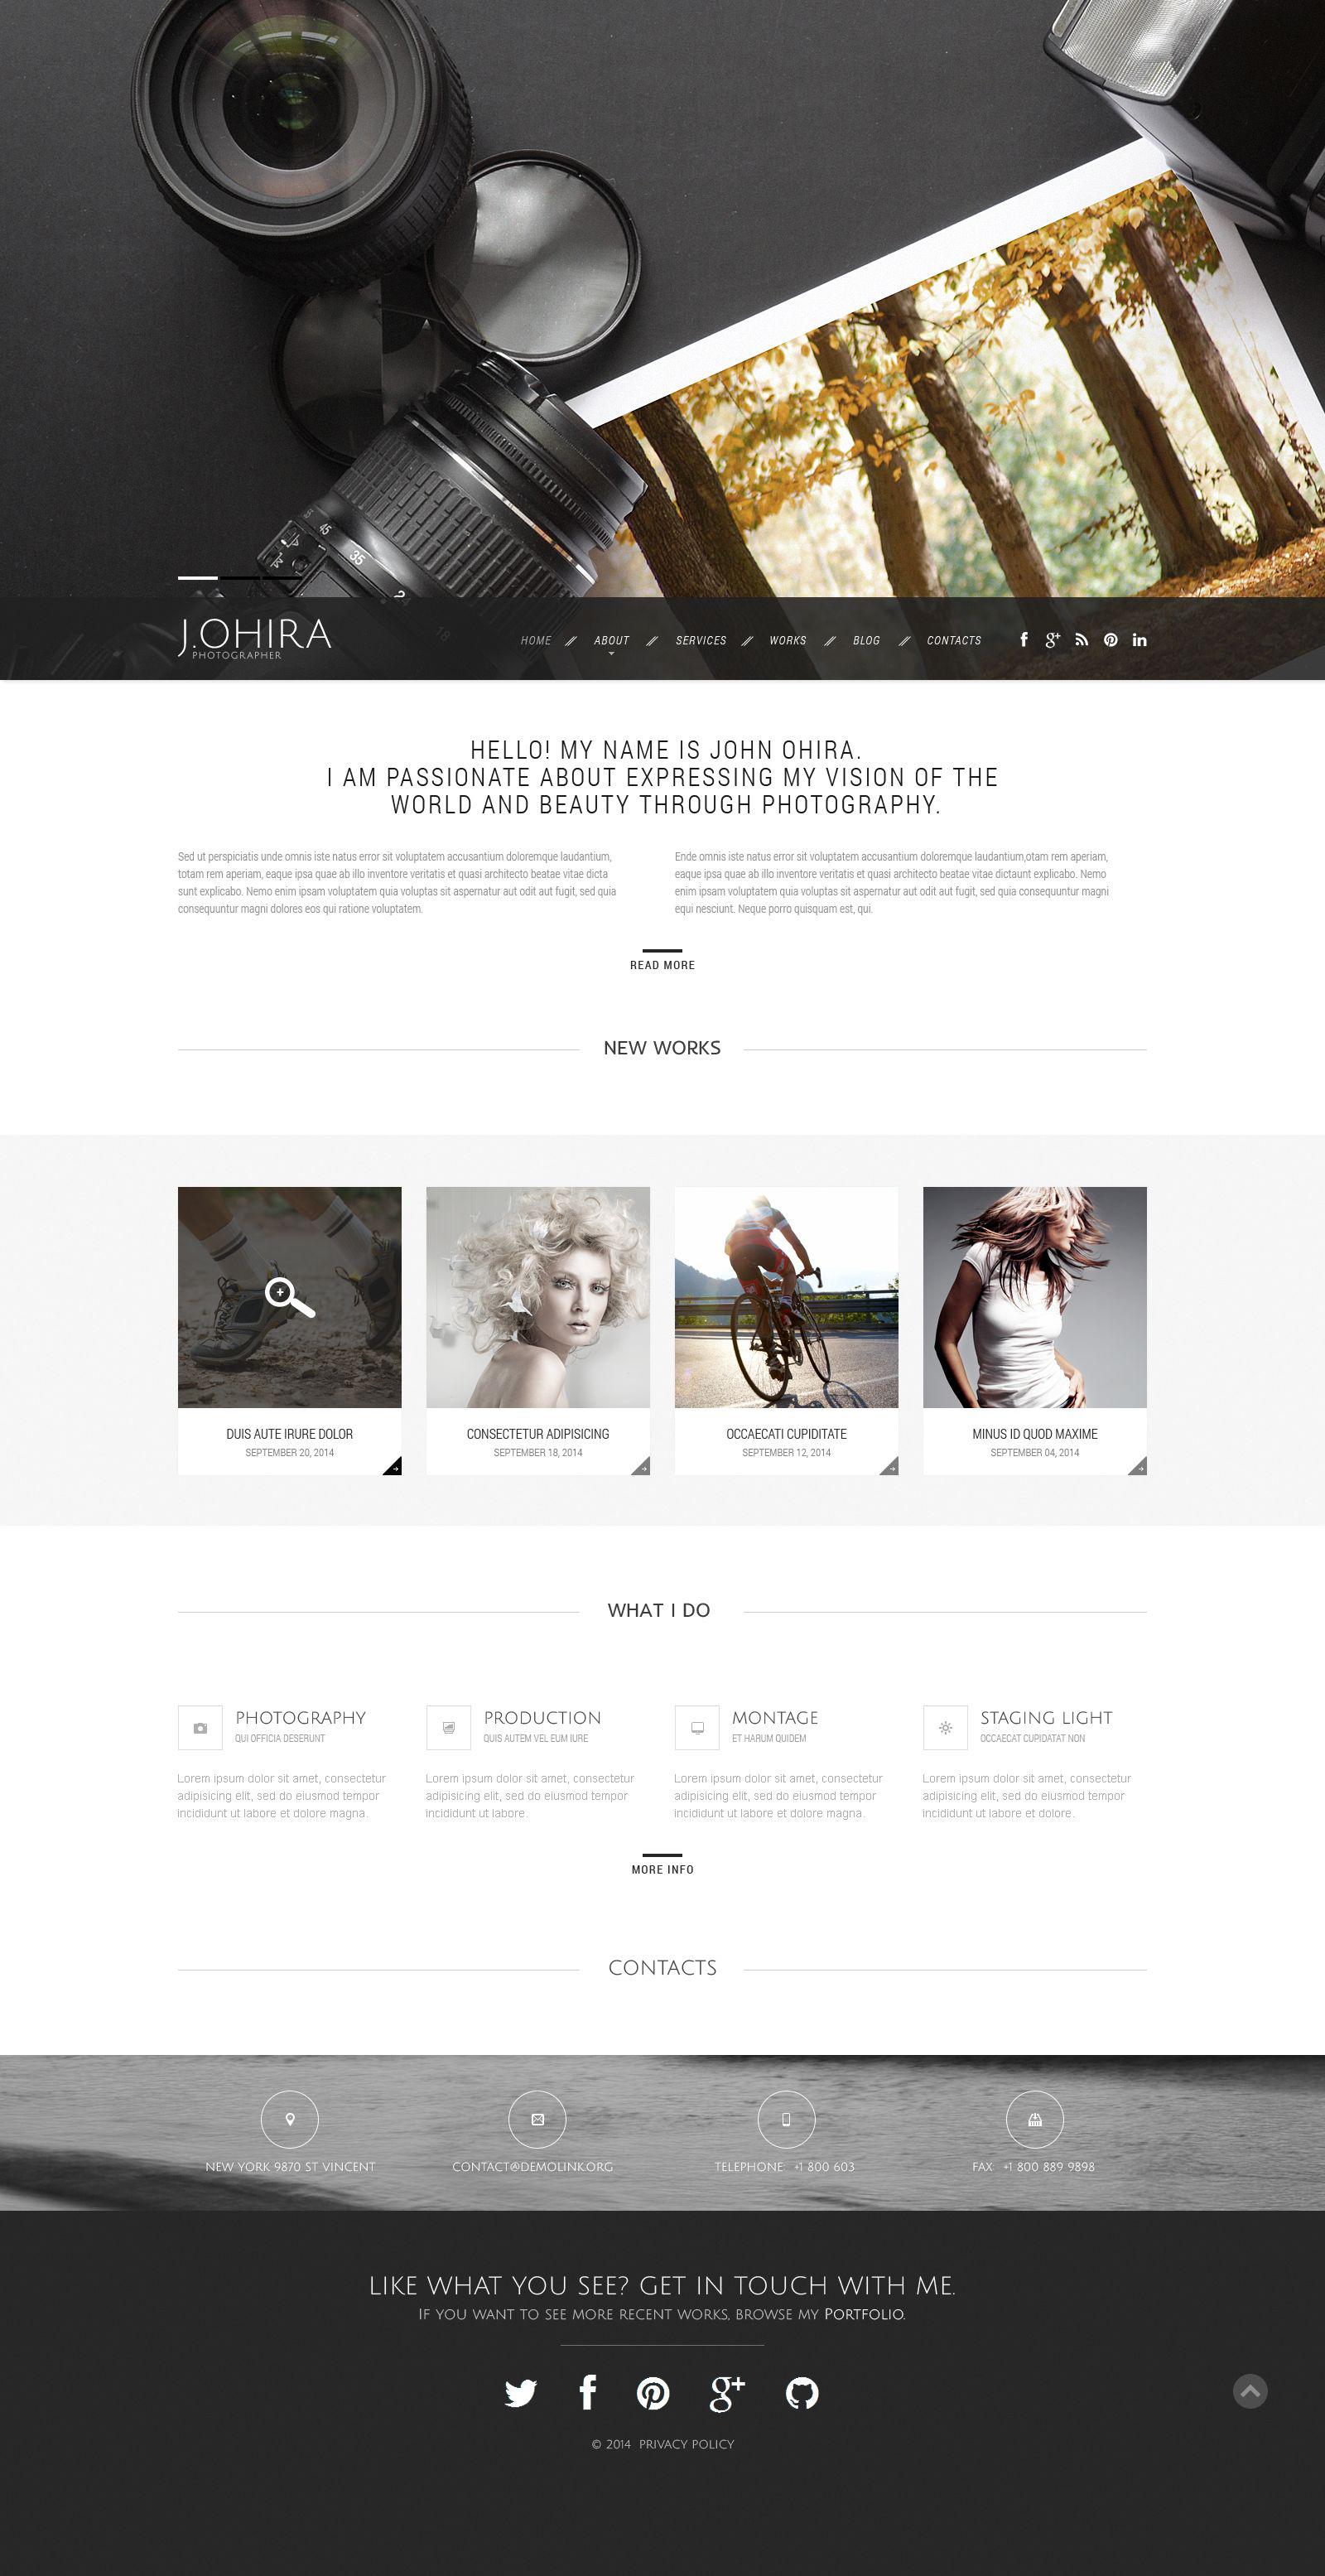 Plantilla Web #52007 para Sitio de Portafolios de fotógrafos